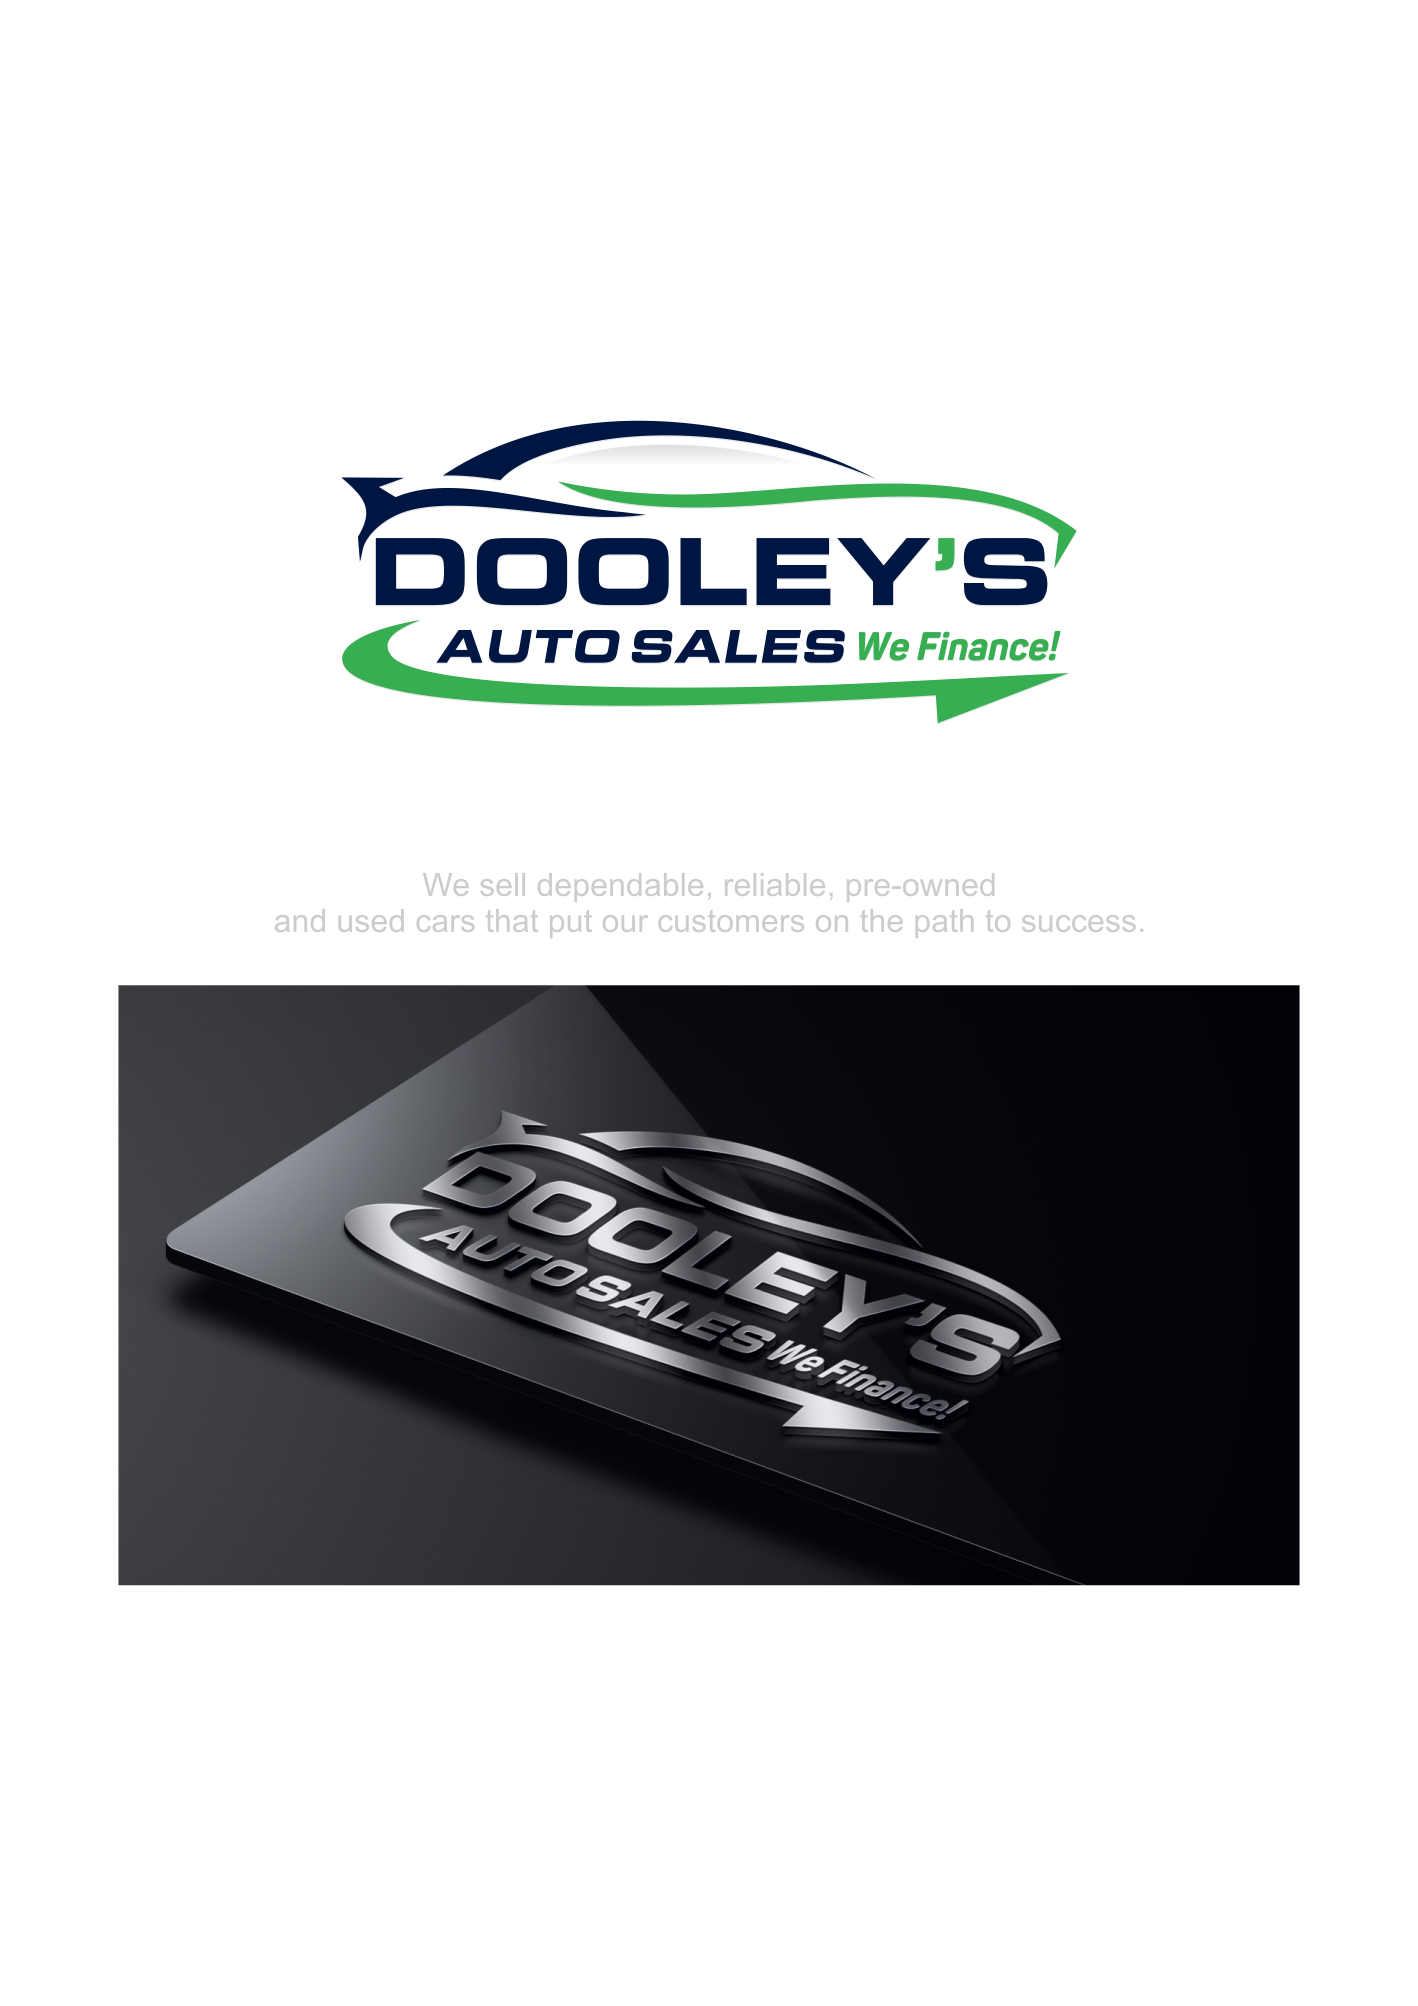 overused logo designs sold on 99designs